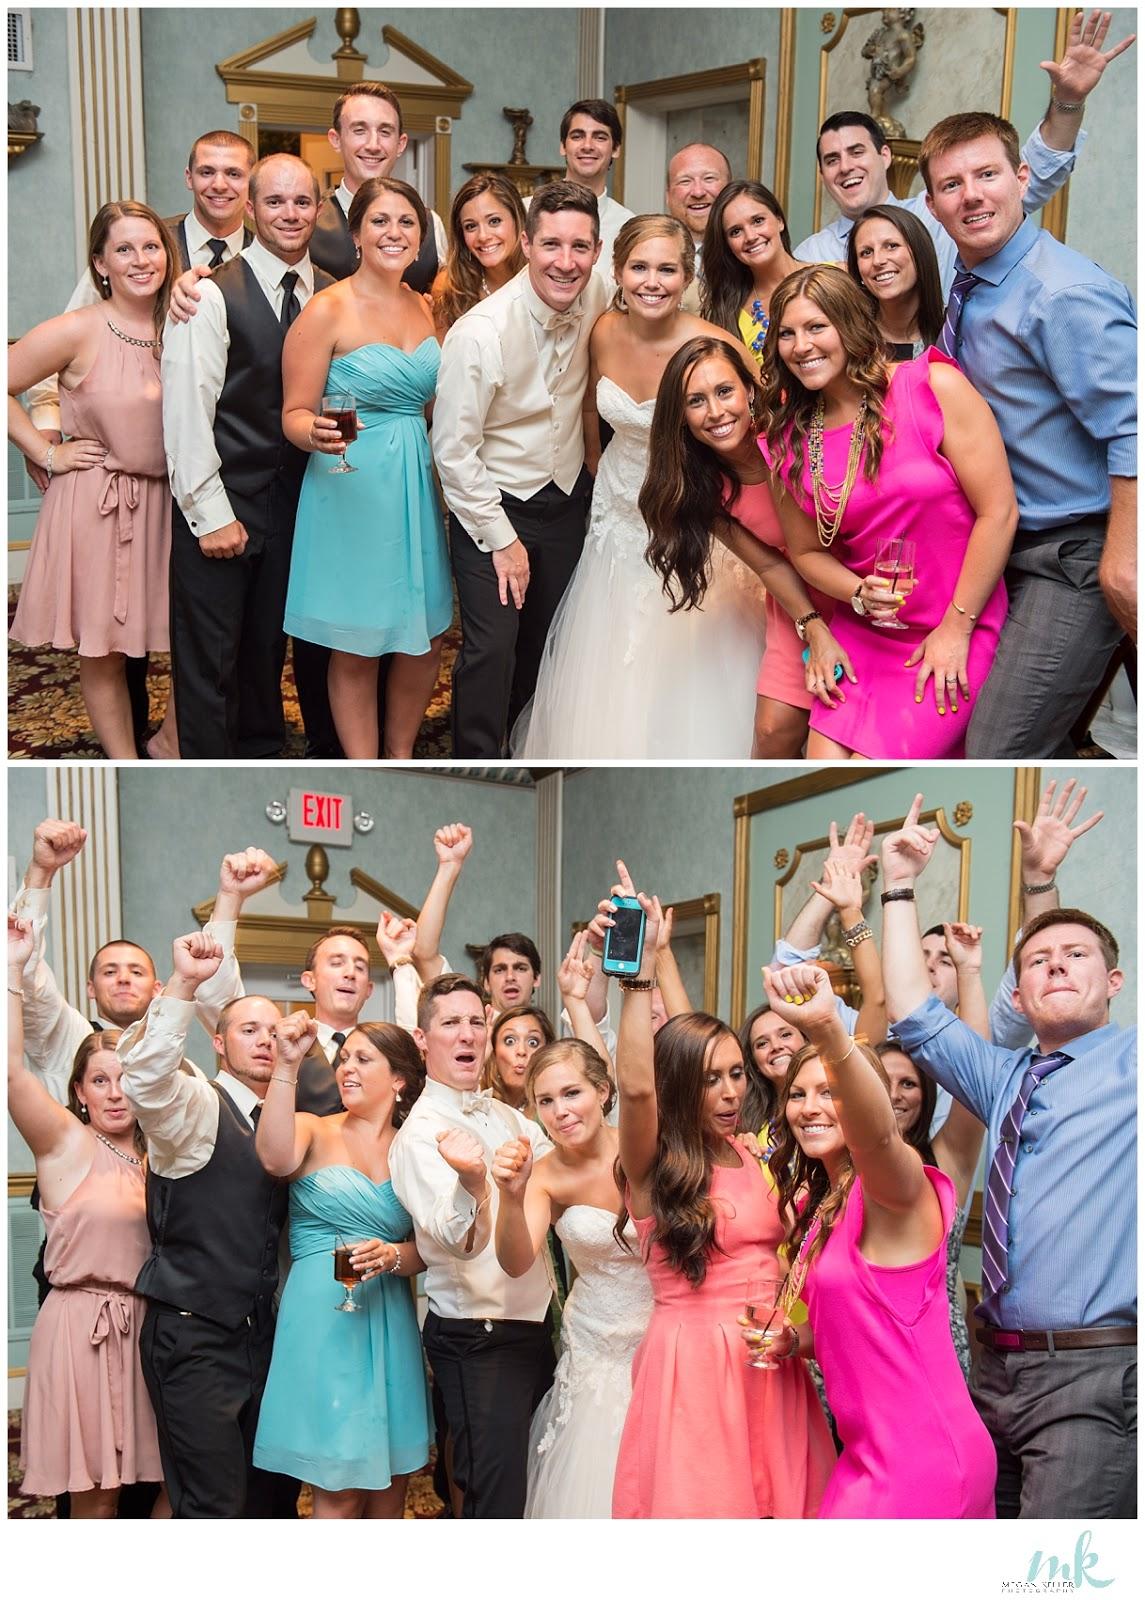 Danielle and Dan's wedding Danielle and Dan's wedding 2014 07 16 0028